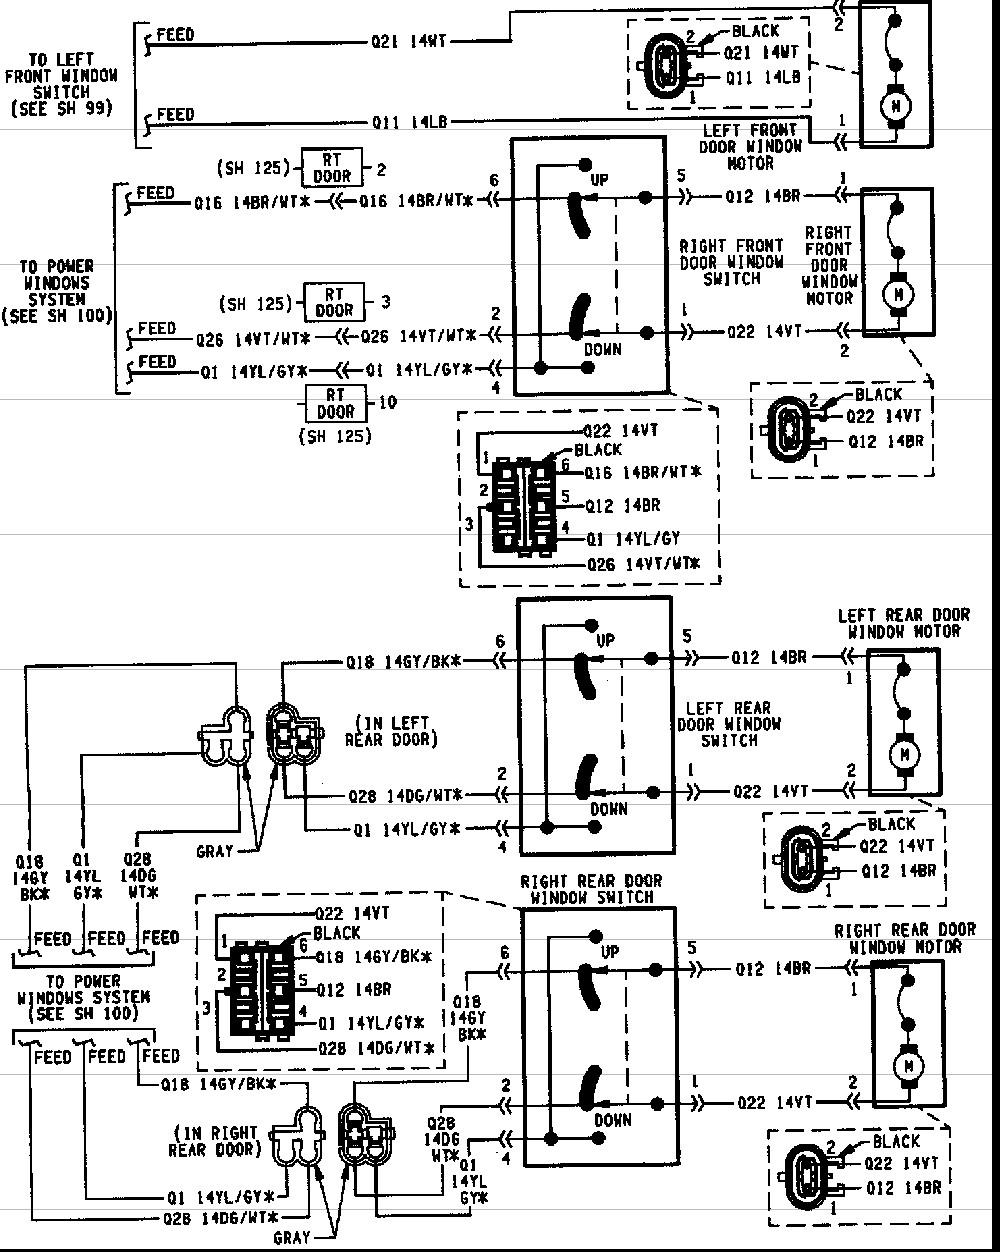 Dd 4522 Cherokee Radio Wiring Diagram 93 Get Free Image About Wiring Diagram Free Diagram